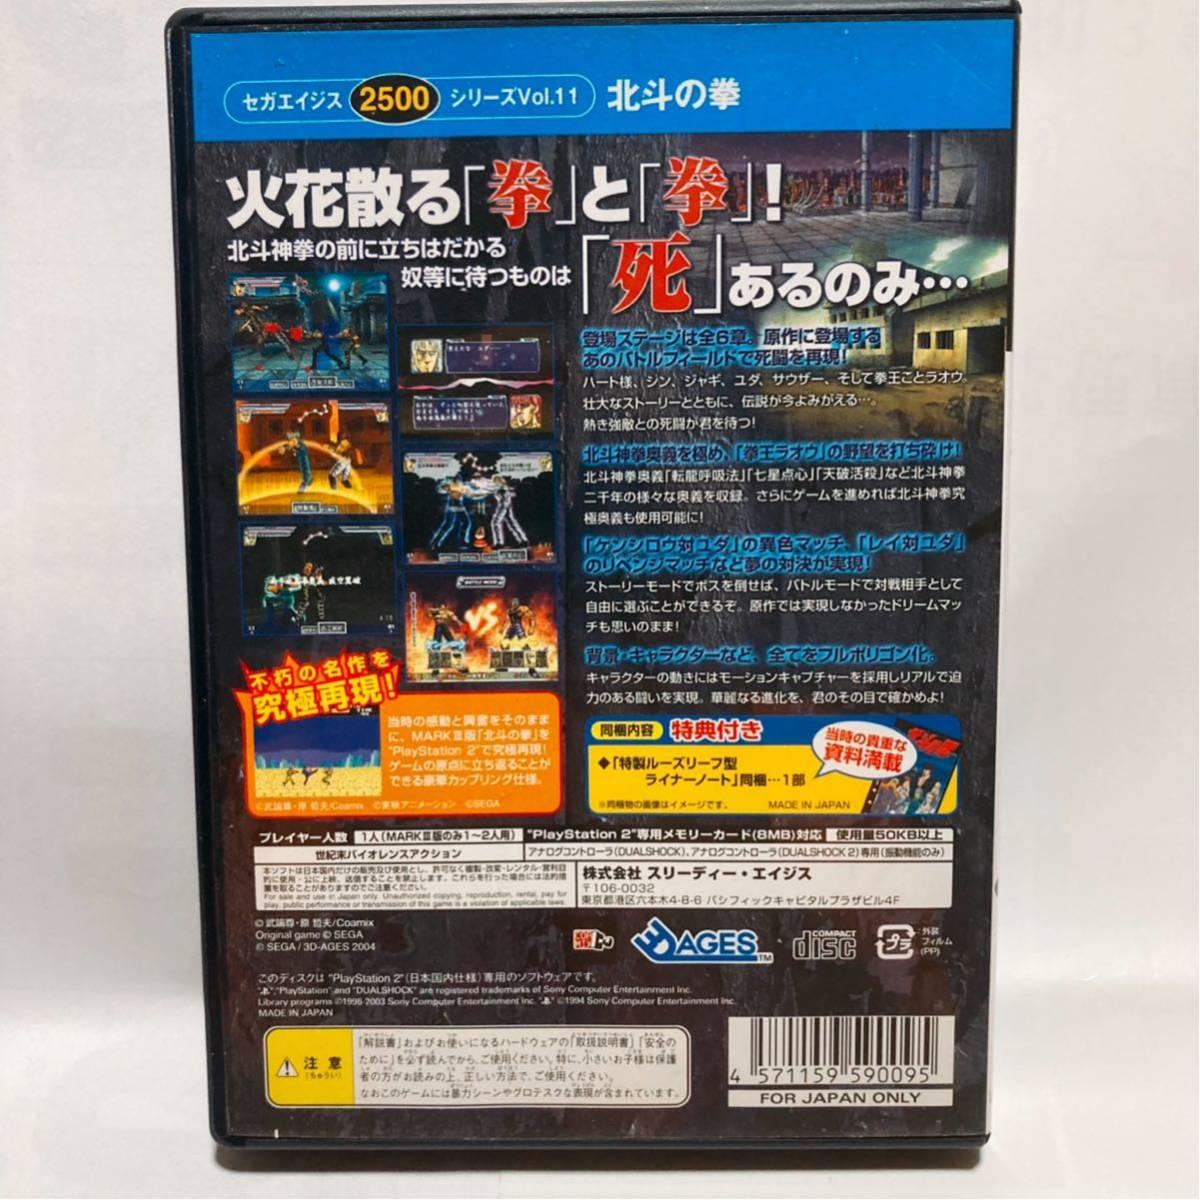 PS2 セガエイジス2500 北斗の拳 説明書 ハガキ クリエーターズノート付 【プレステ2 プレイステーション2 】